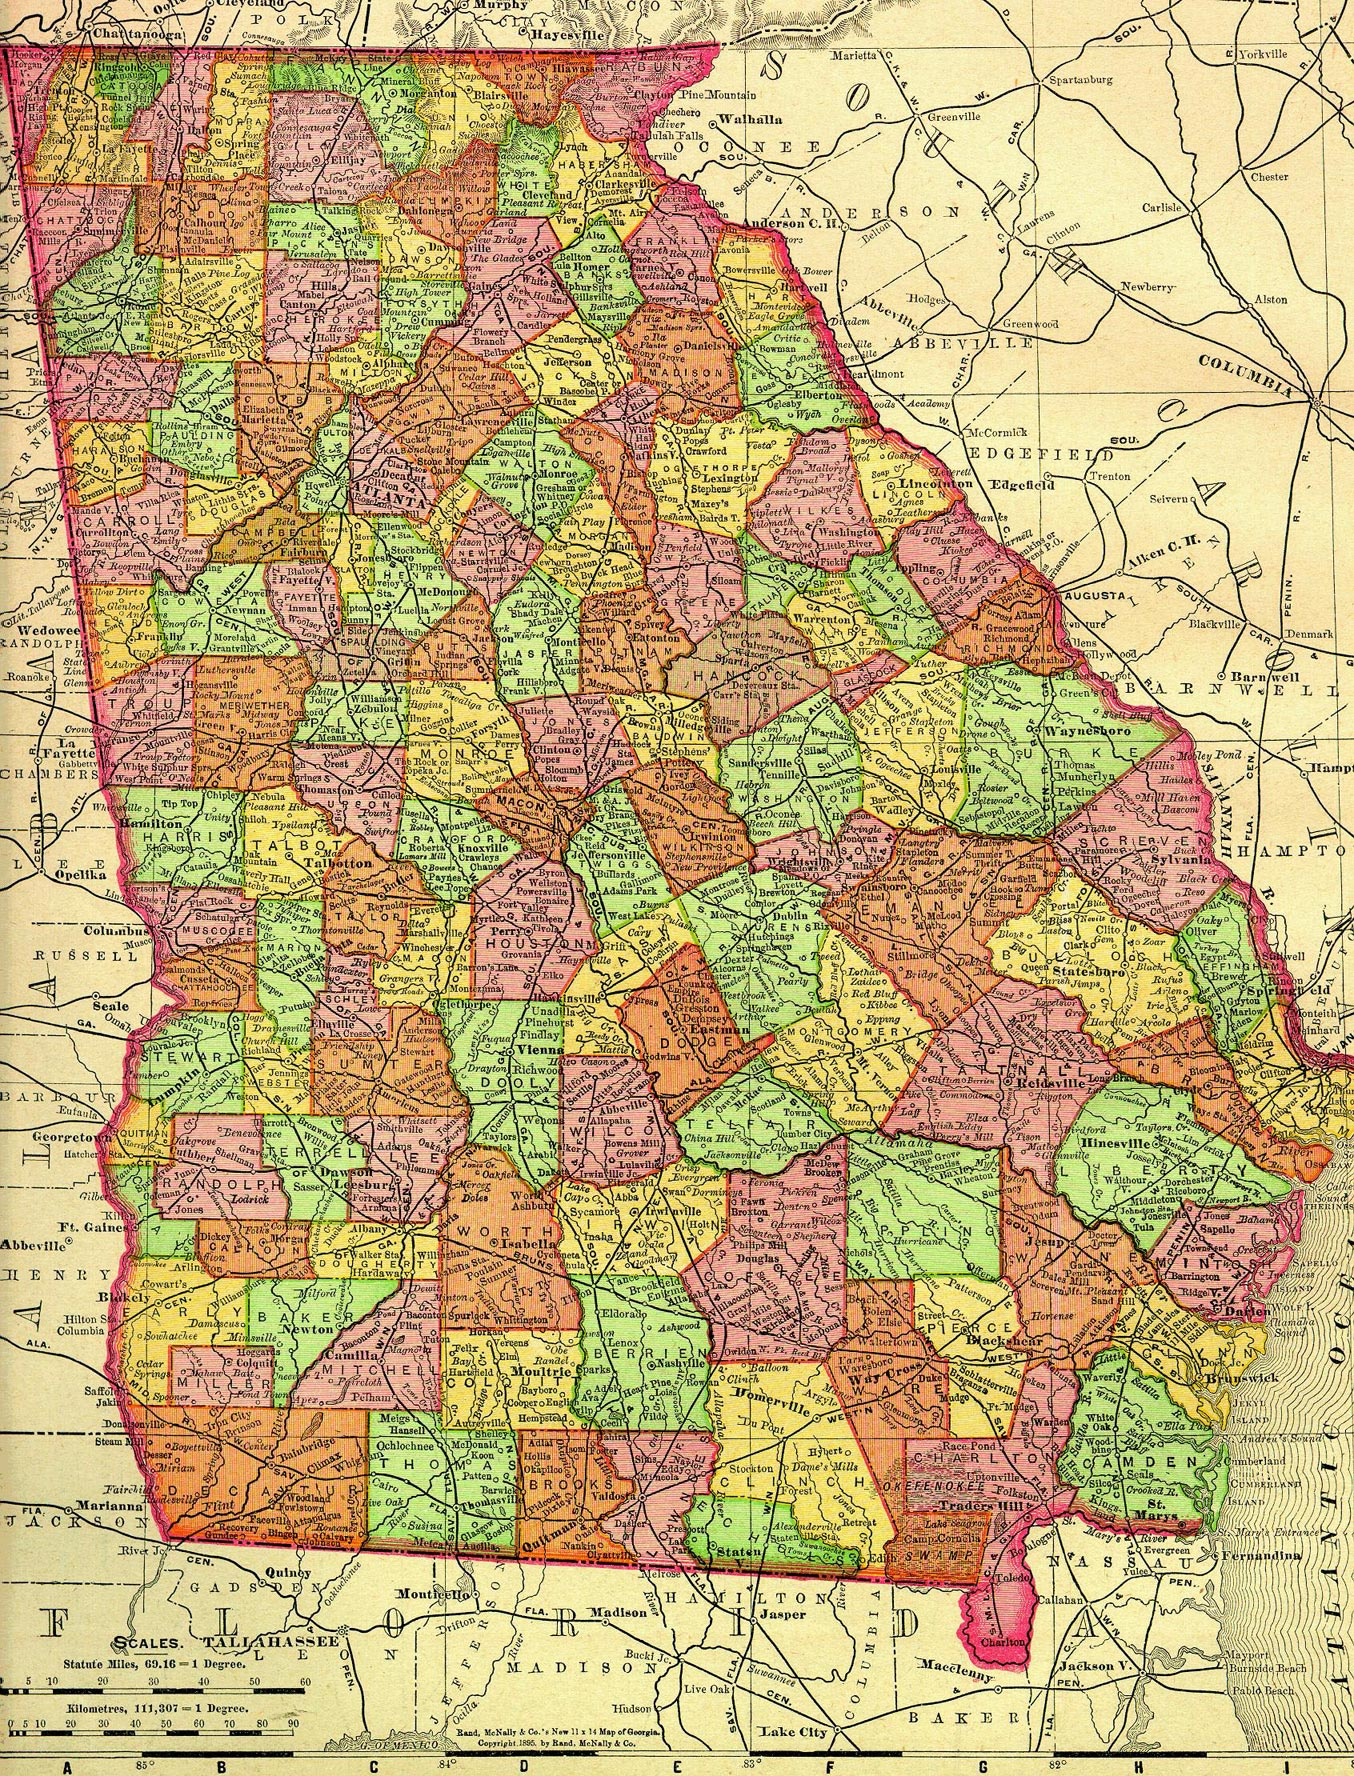 #39: Southeast Cumberville, GA with Michael Matson